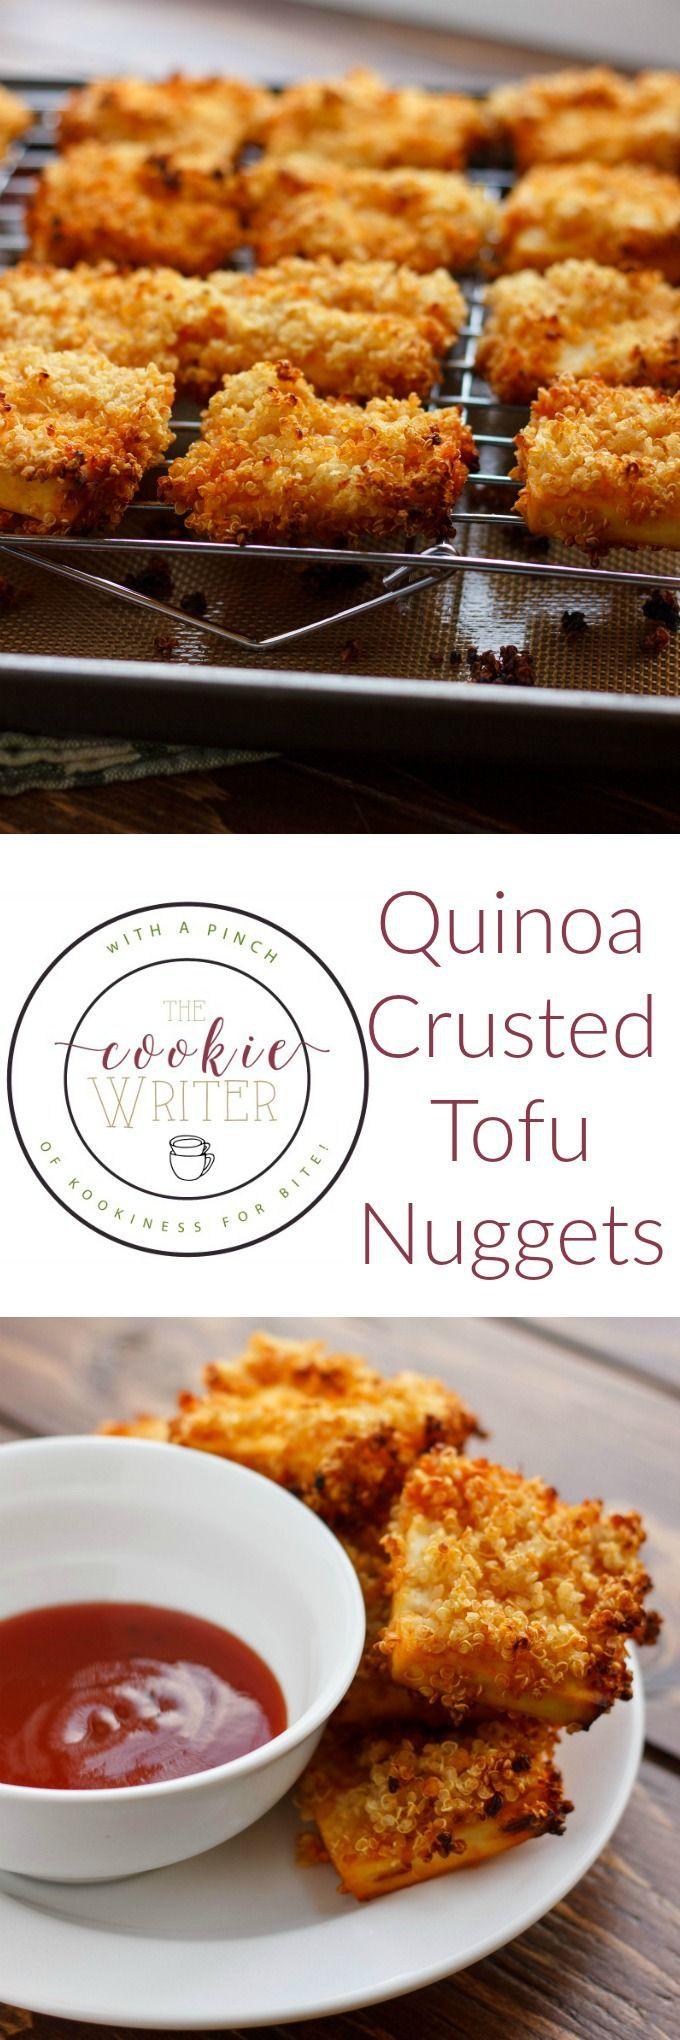 Quinoa Crusted Tofu Nuggets (Tofu Chicken Nuggets!) #tofunuggets